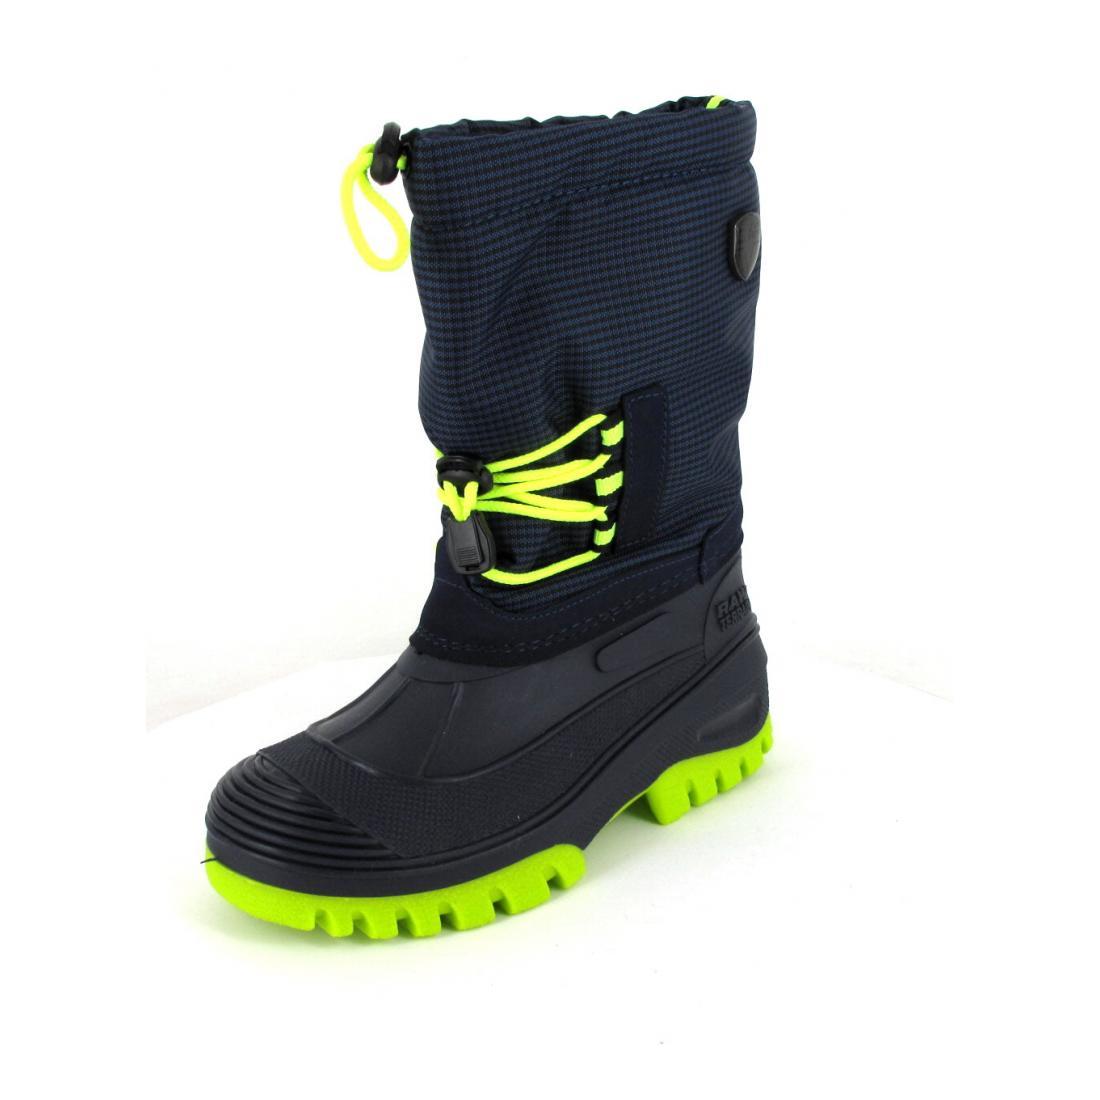 CMP Gummistiefel Kids Ahto WP Snow Boots